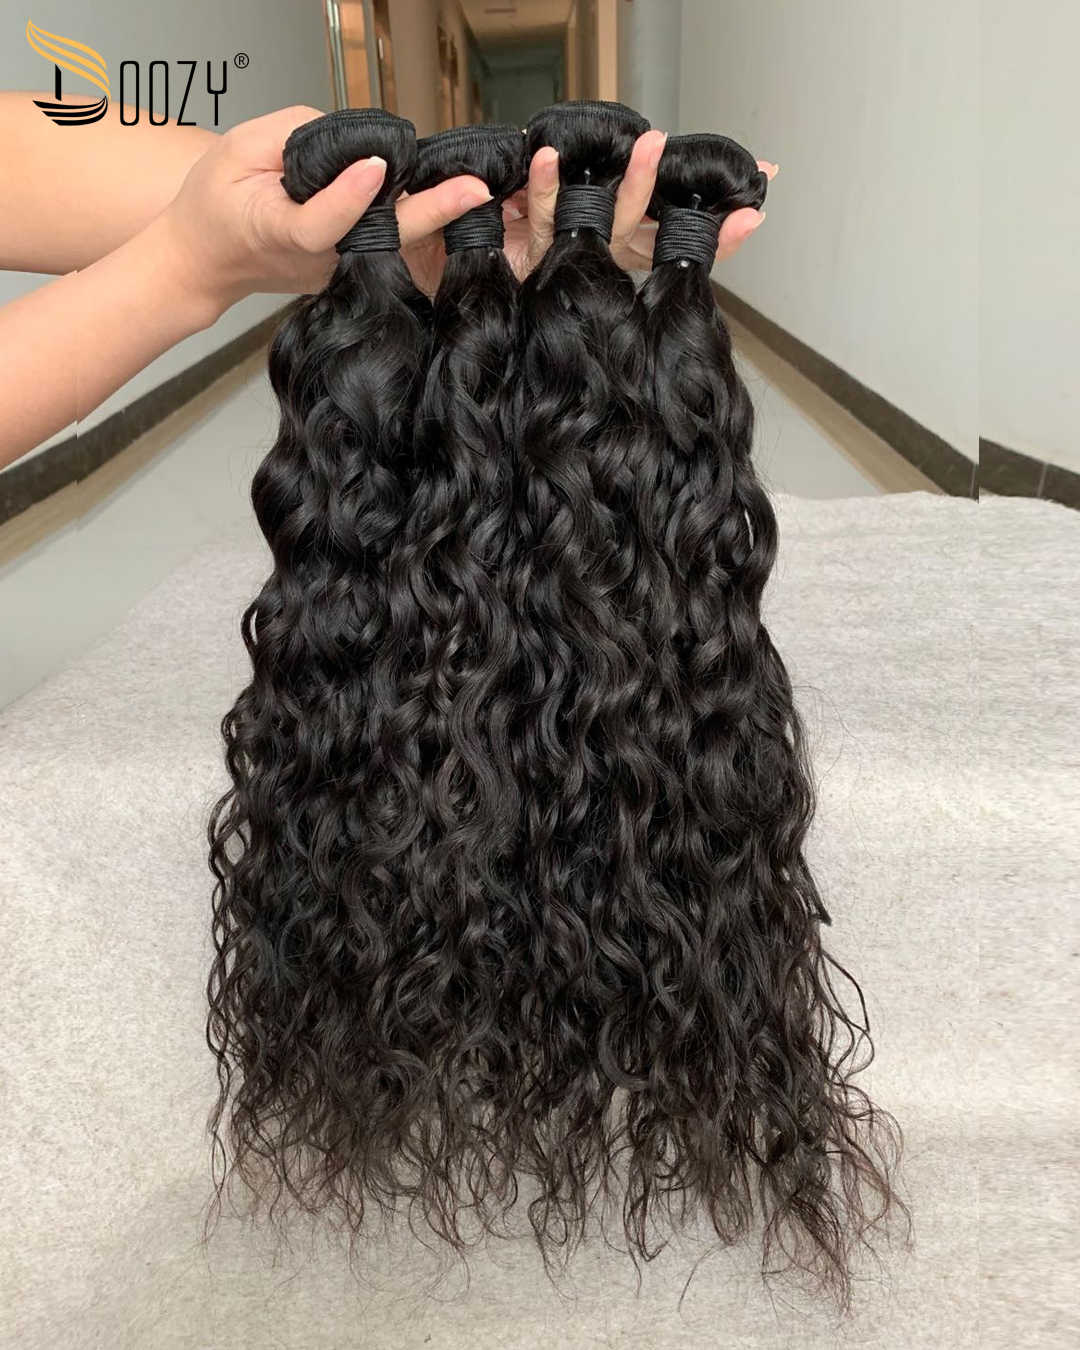 Doozy Ombre 1b/cabello humano Rosa 3 Paquetes de extensiones de cabello de oro rosa Remy pelo humano brasileño recto